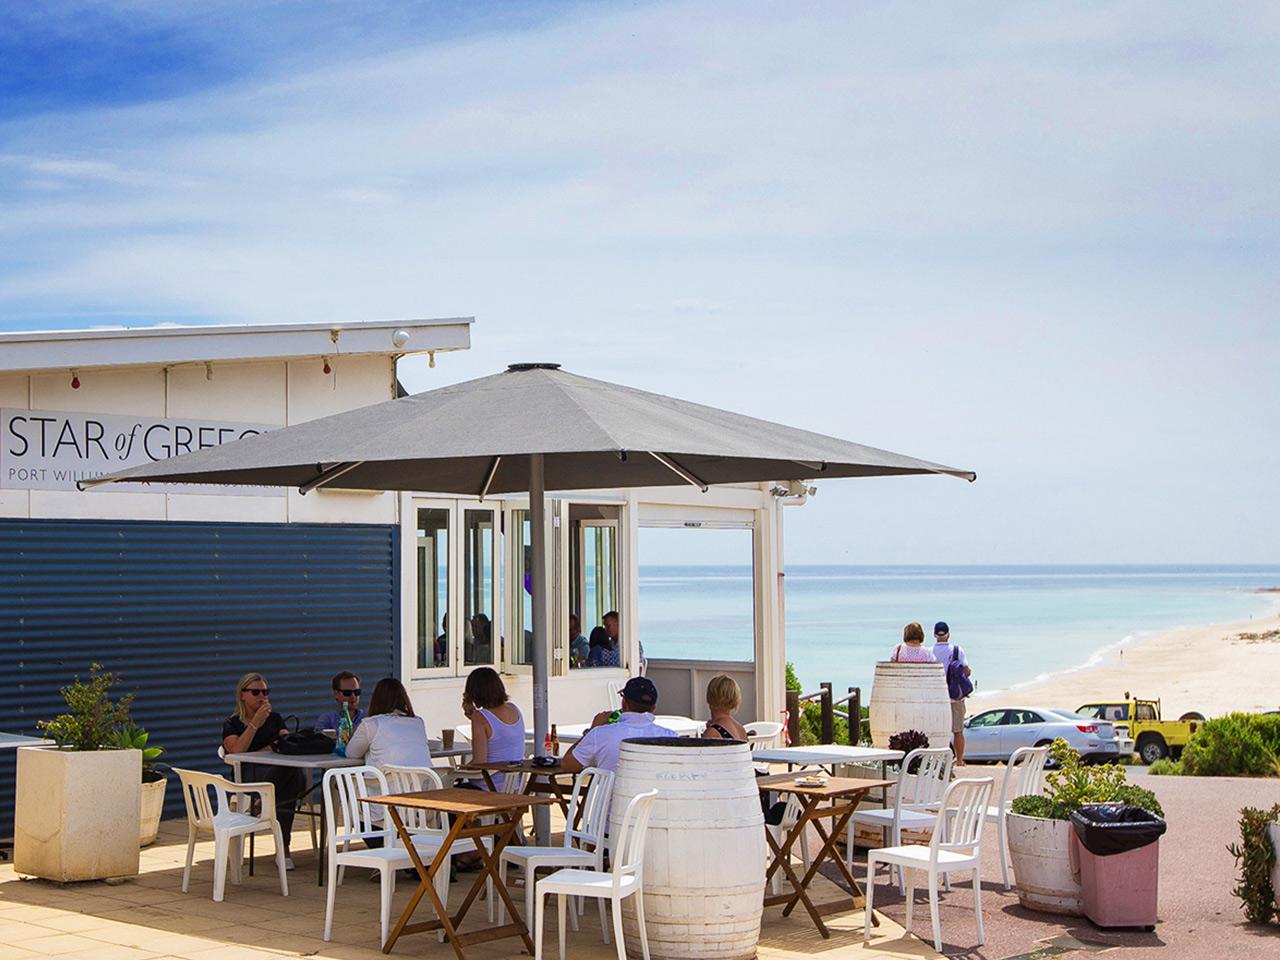 Listopedia: Australia's best beachside restaurants